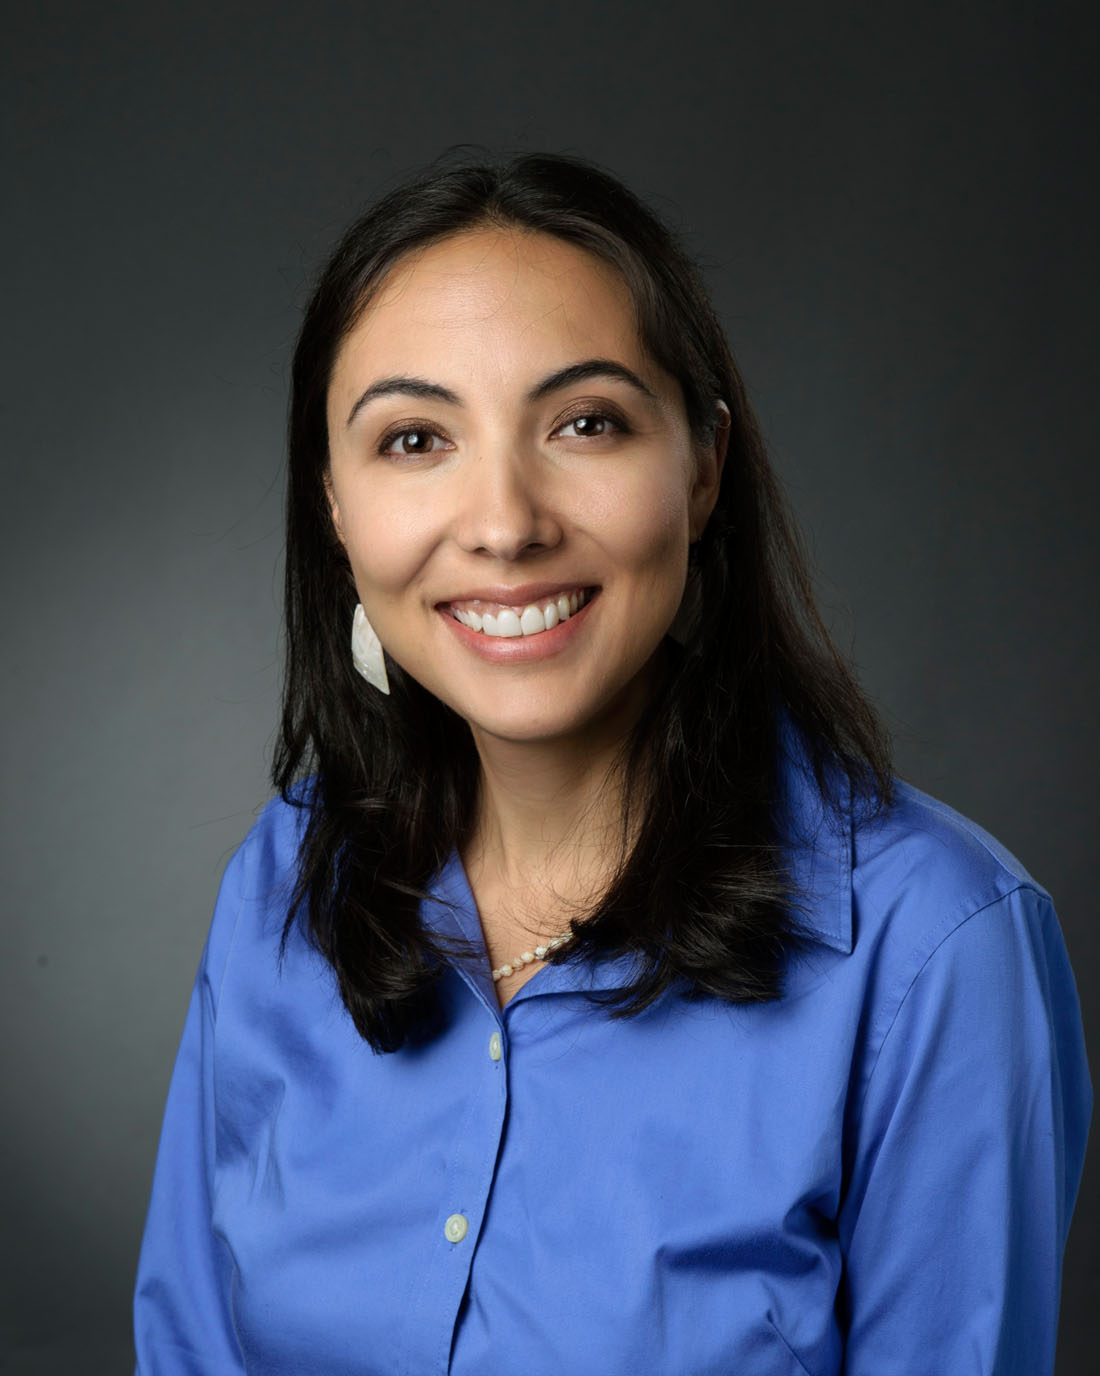 Vanessa Simonds, ScD